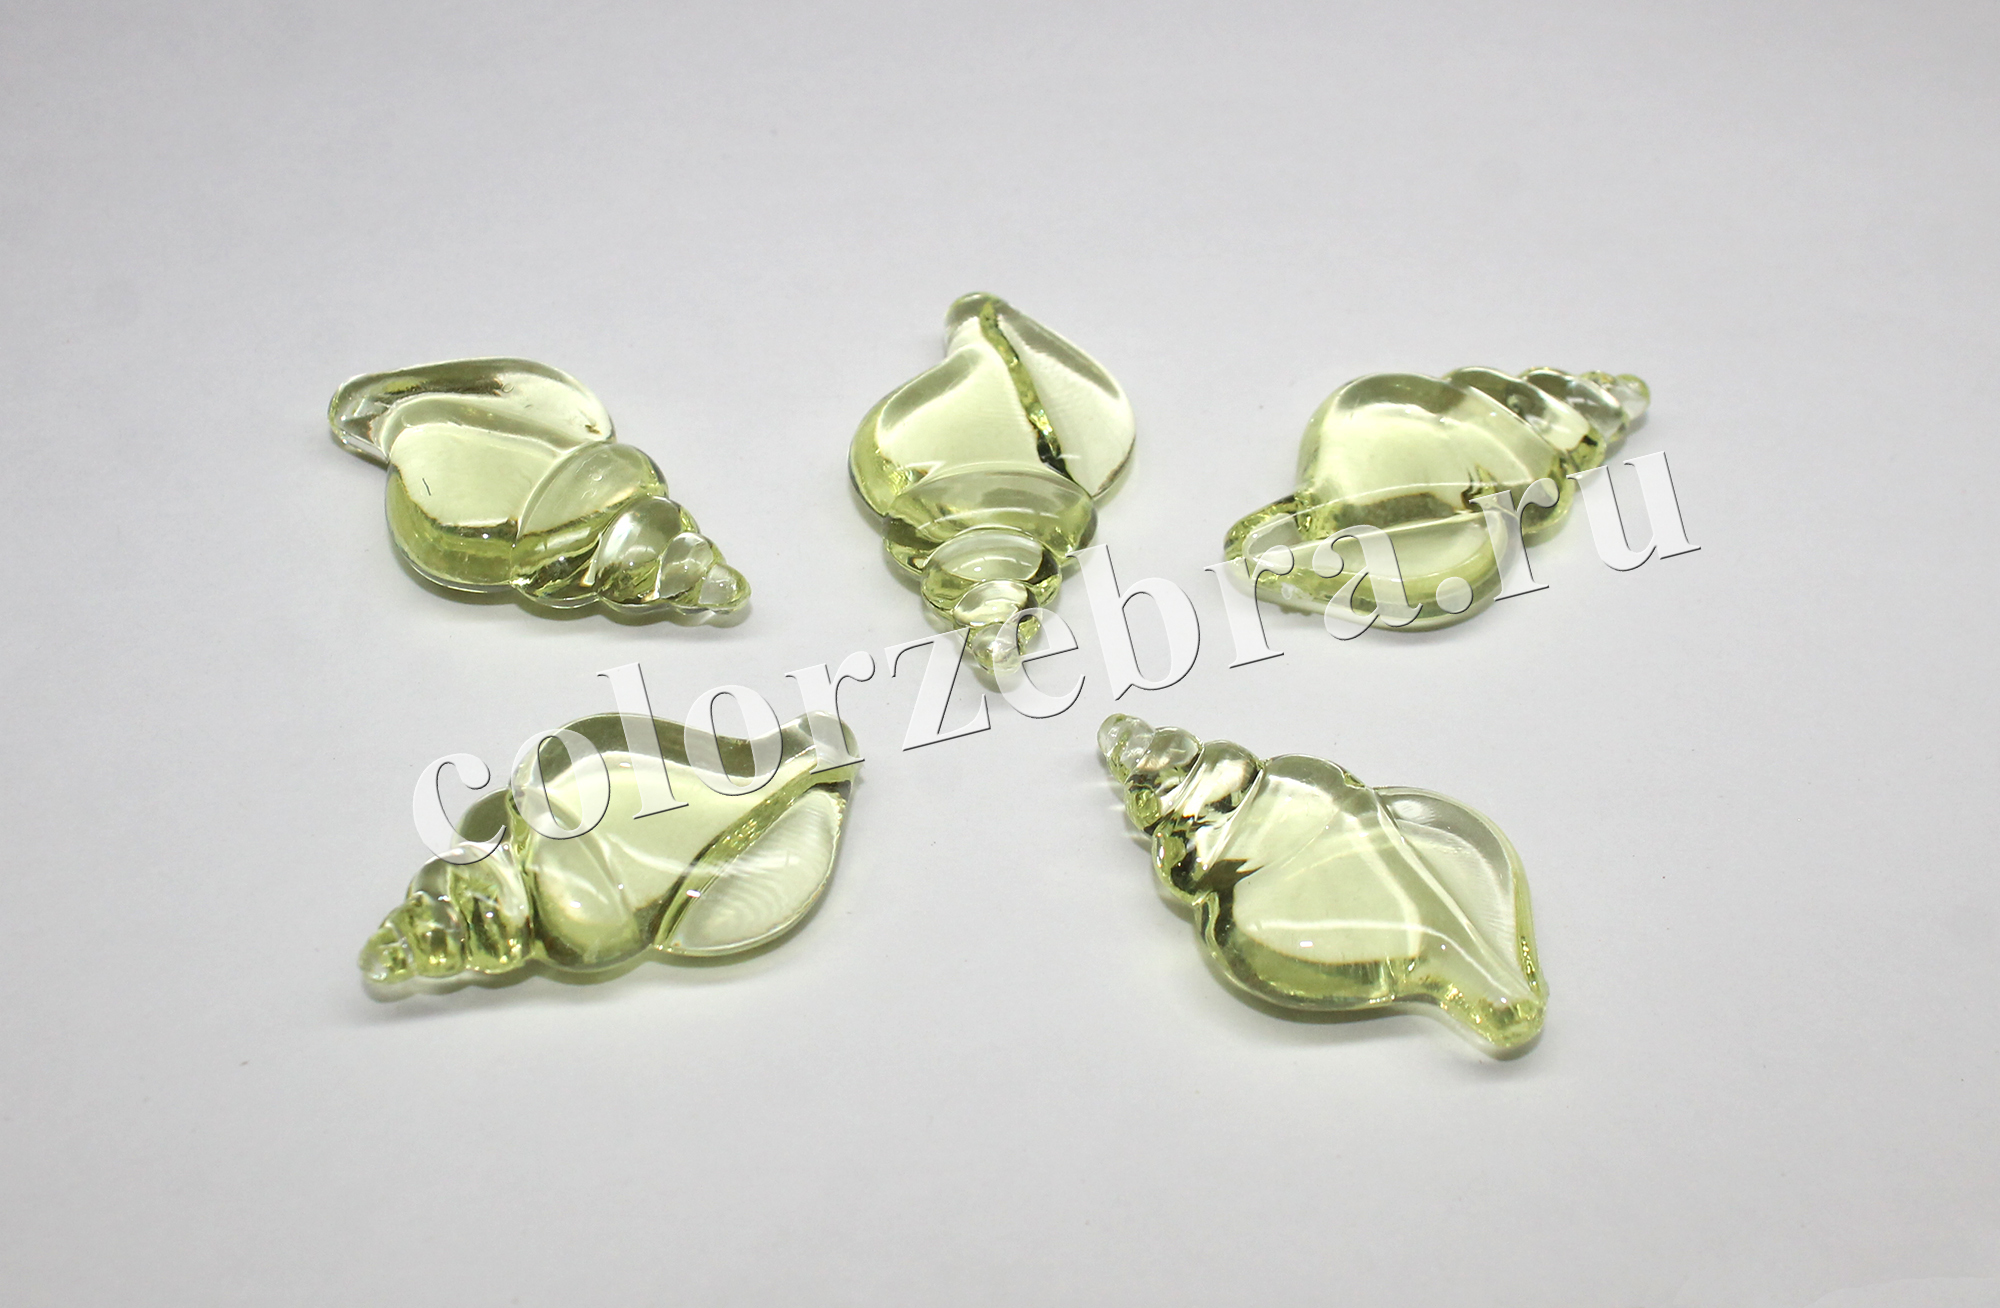 Декоративные ракушки пластиковые